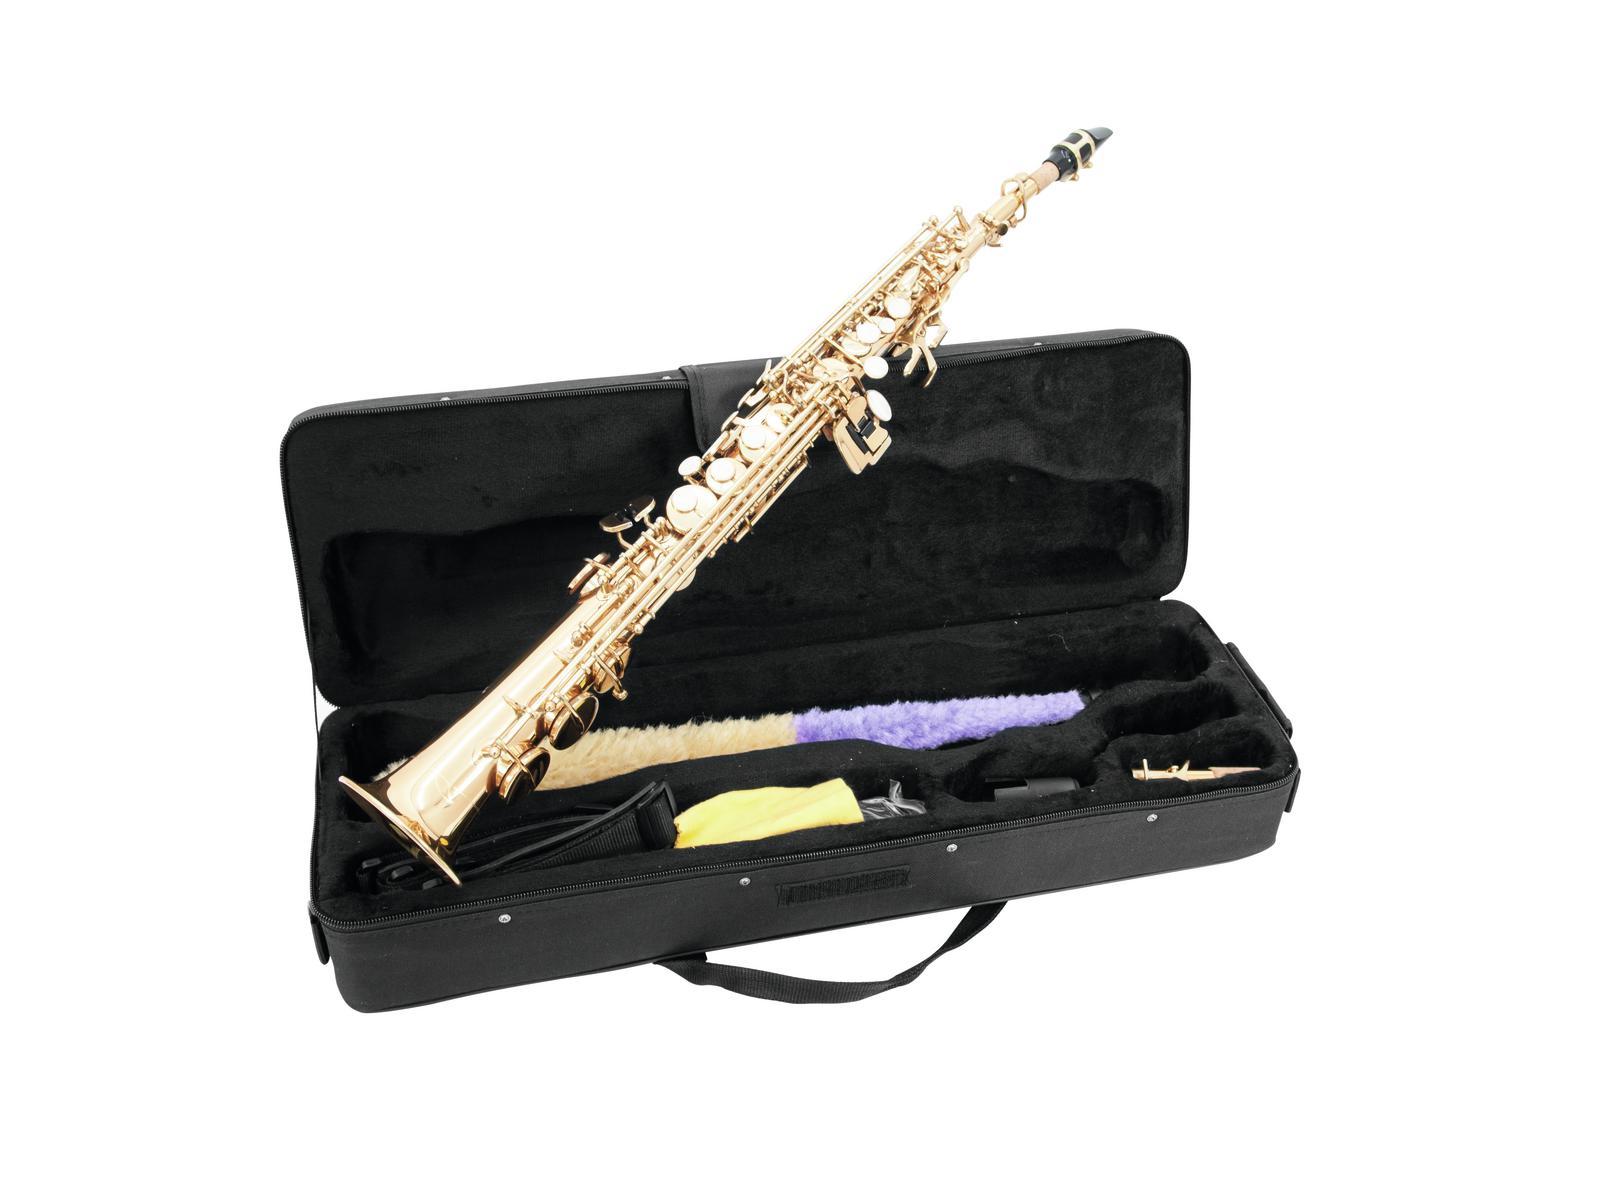 Fotografie Dimavery SP-10 B soprán saxofon, rovný